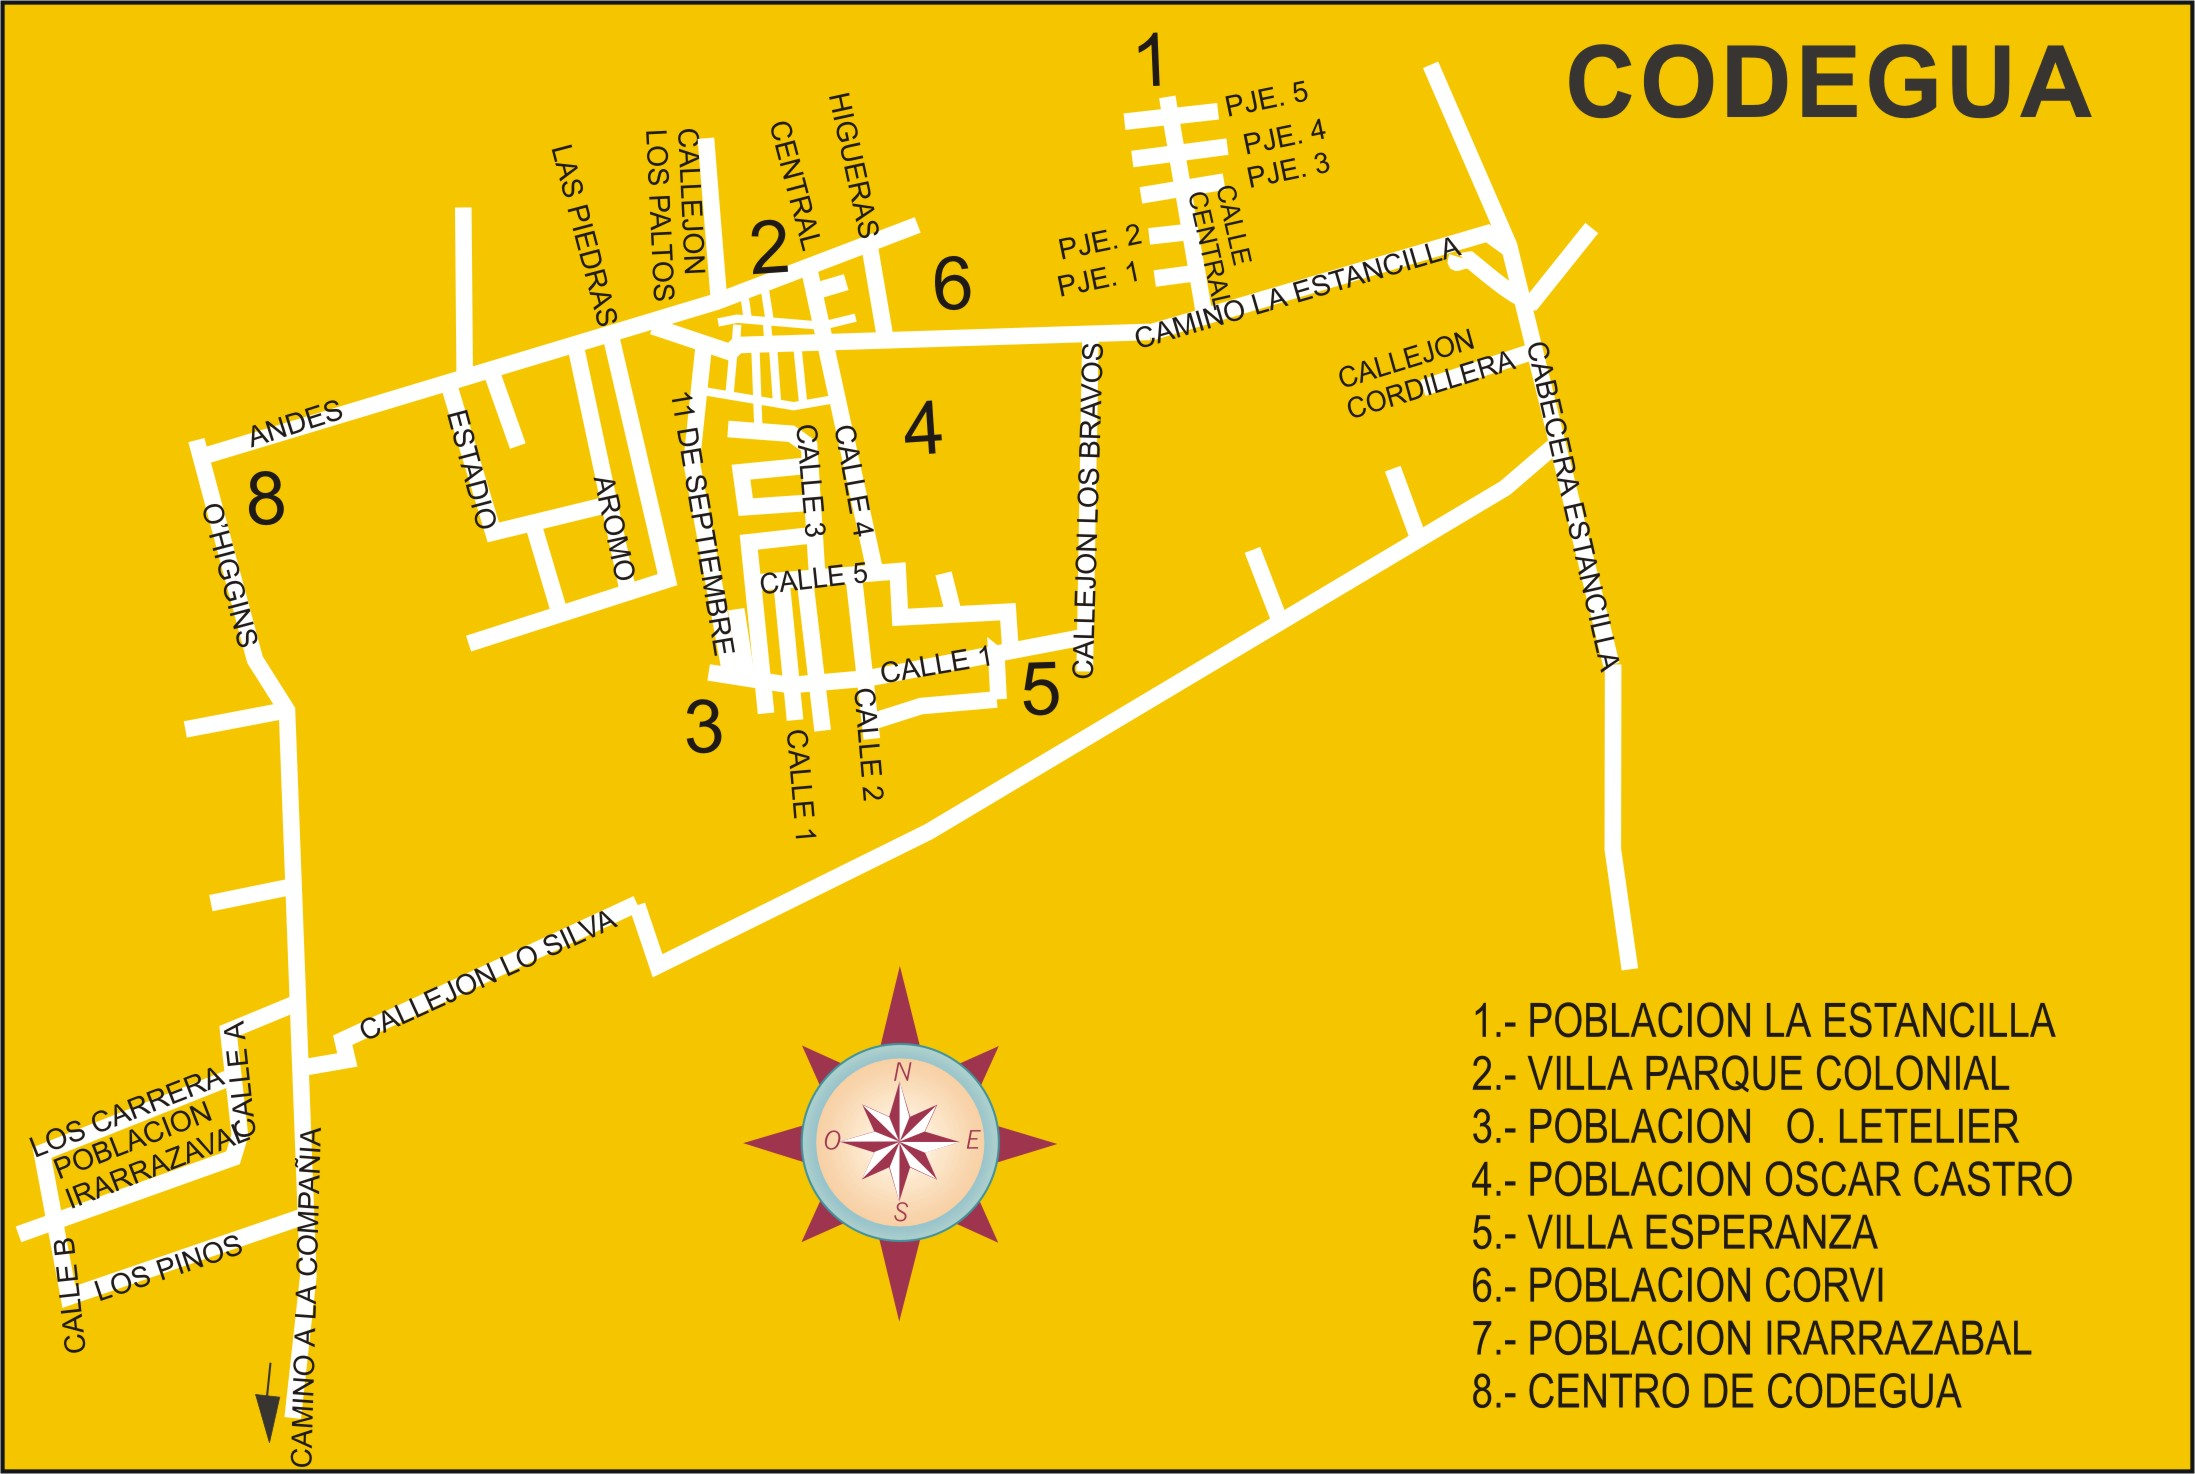 Codegua Map Codegua Chile Mappery